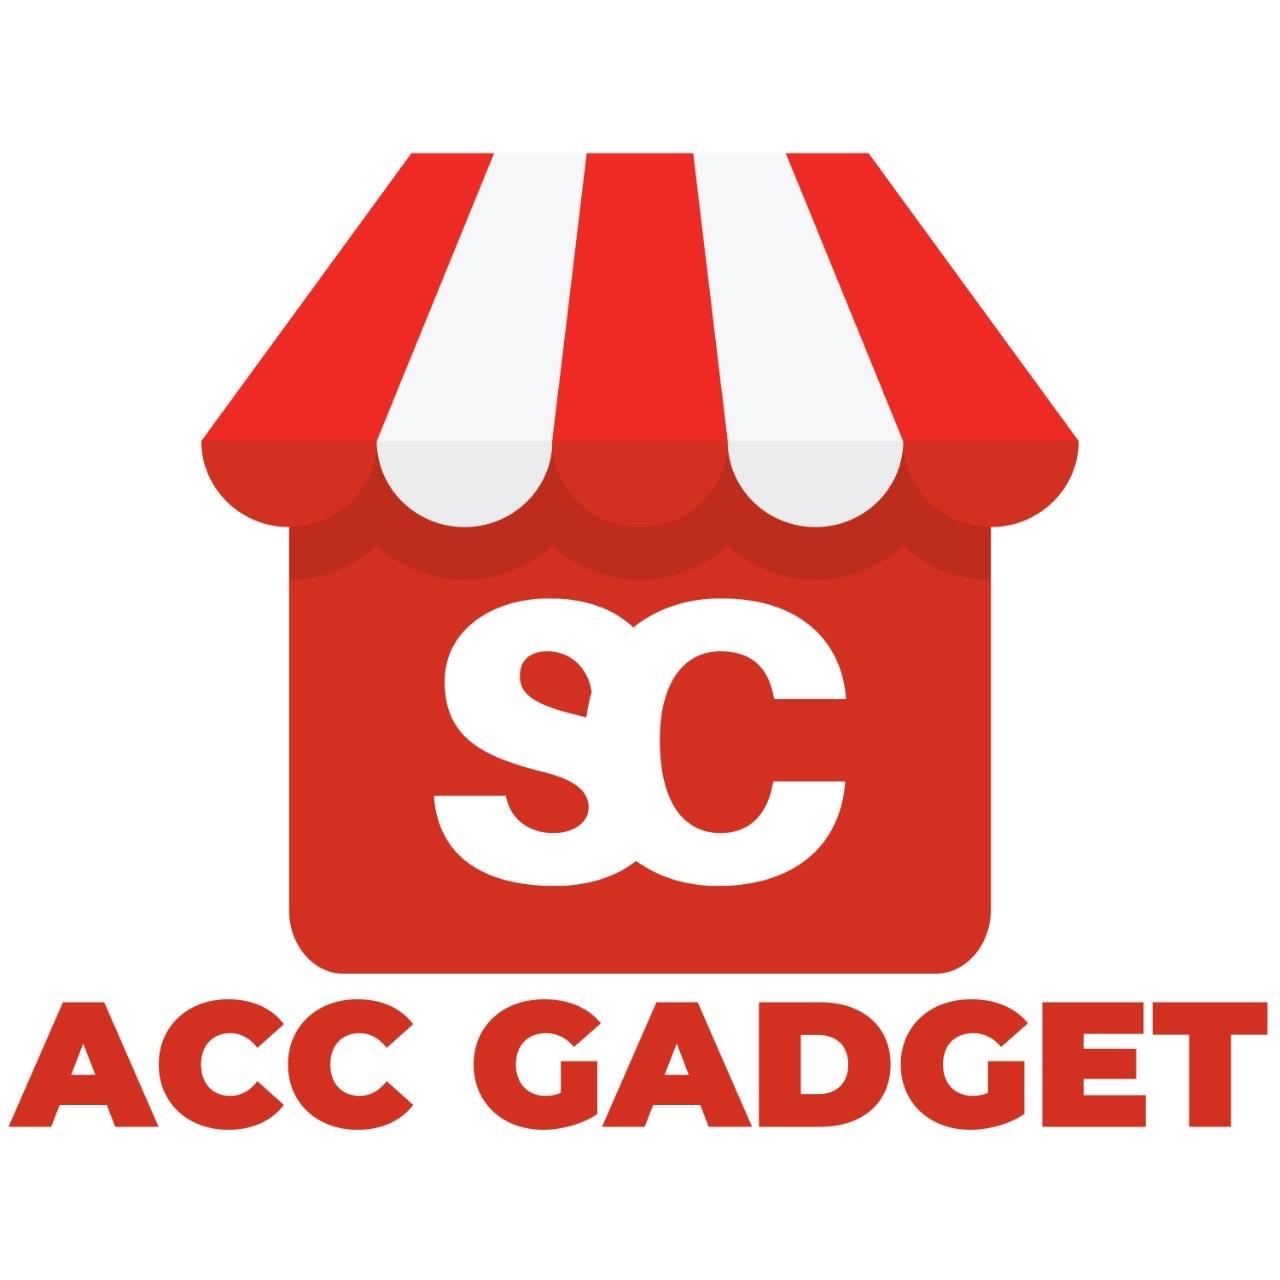 SC Acc Gadget